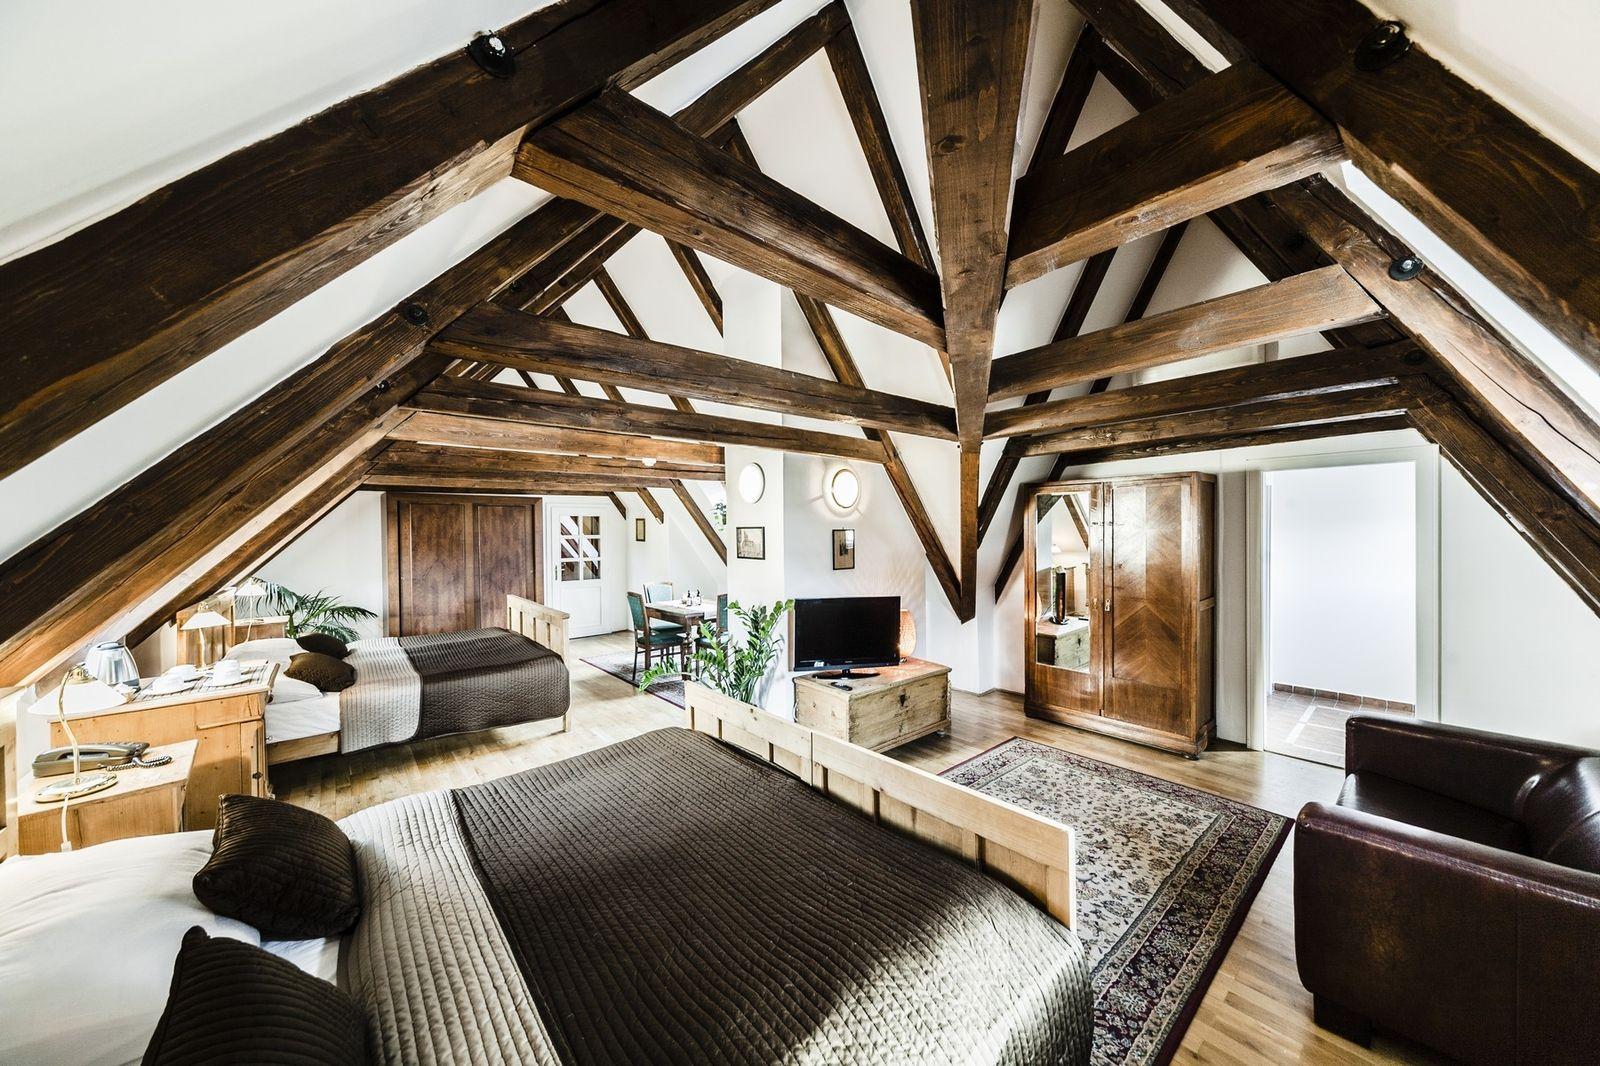 Prague Family Hotel Room - Accommodation Prague City ...